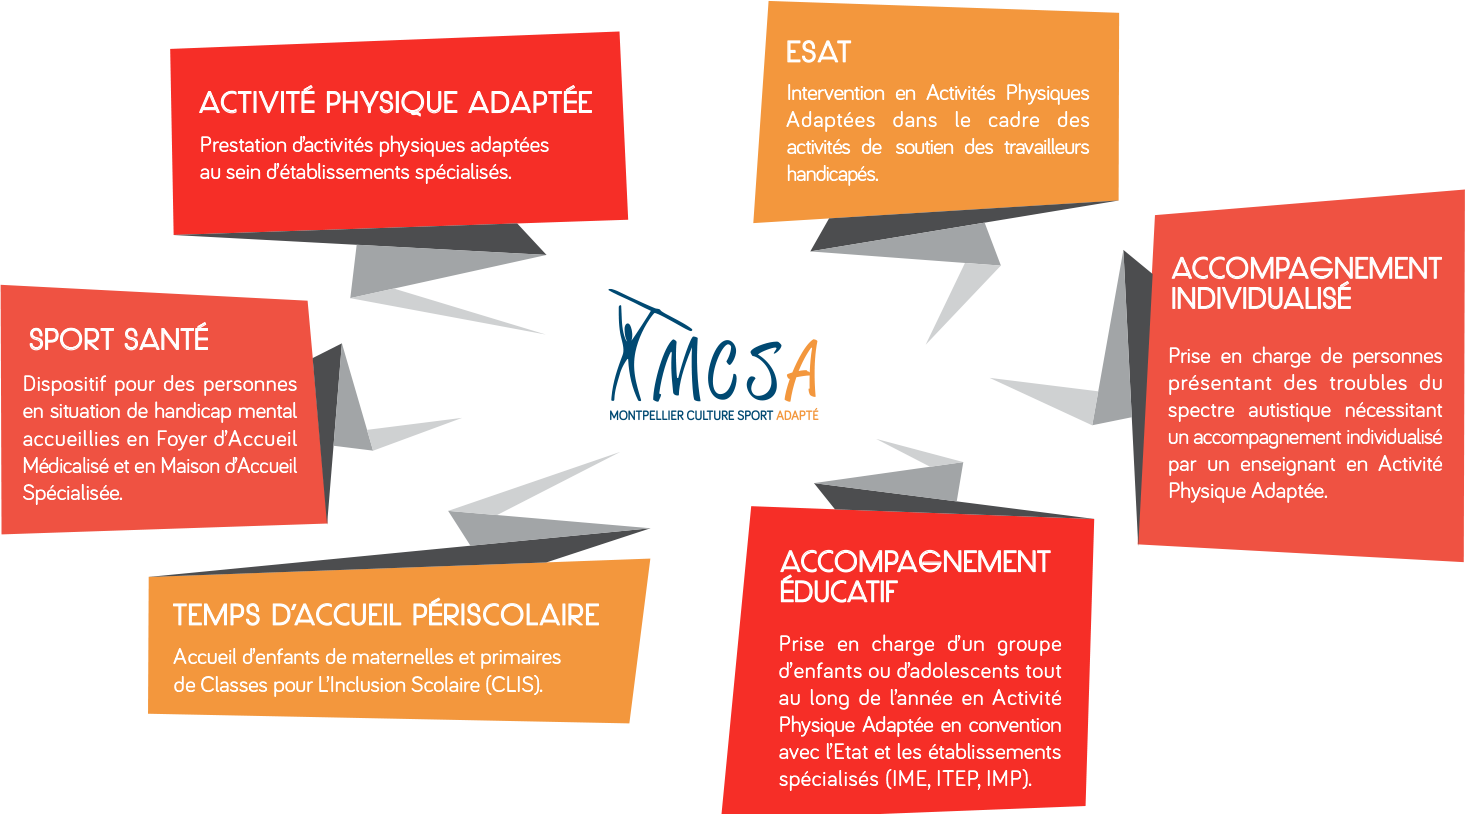 MCSA | Montpellier Culture Sport Adapté - Intervention